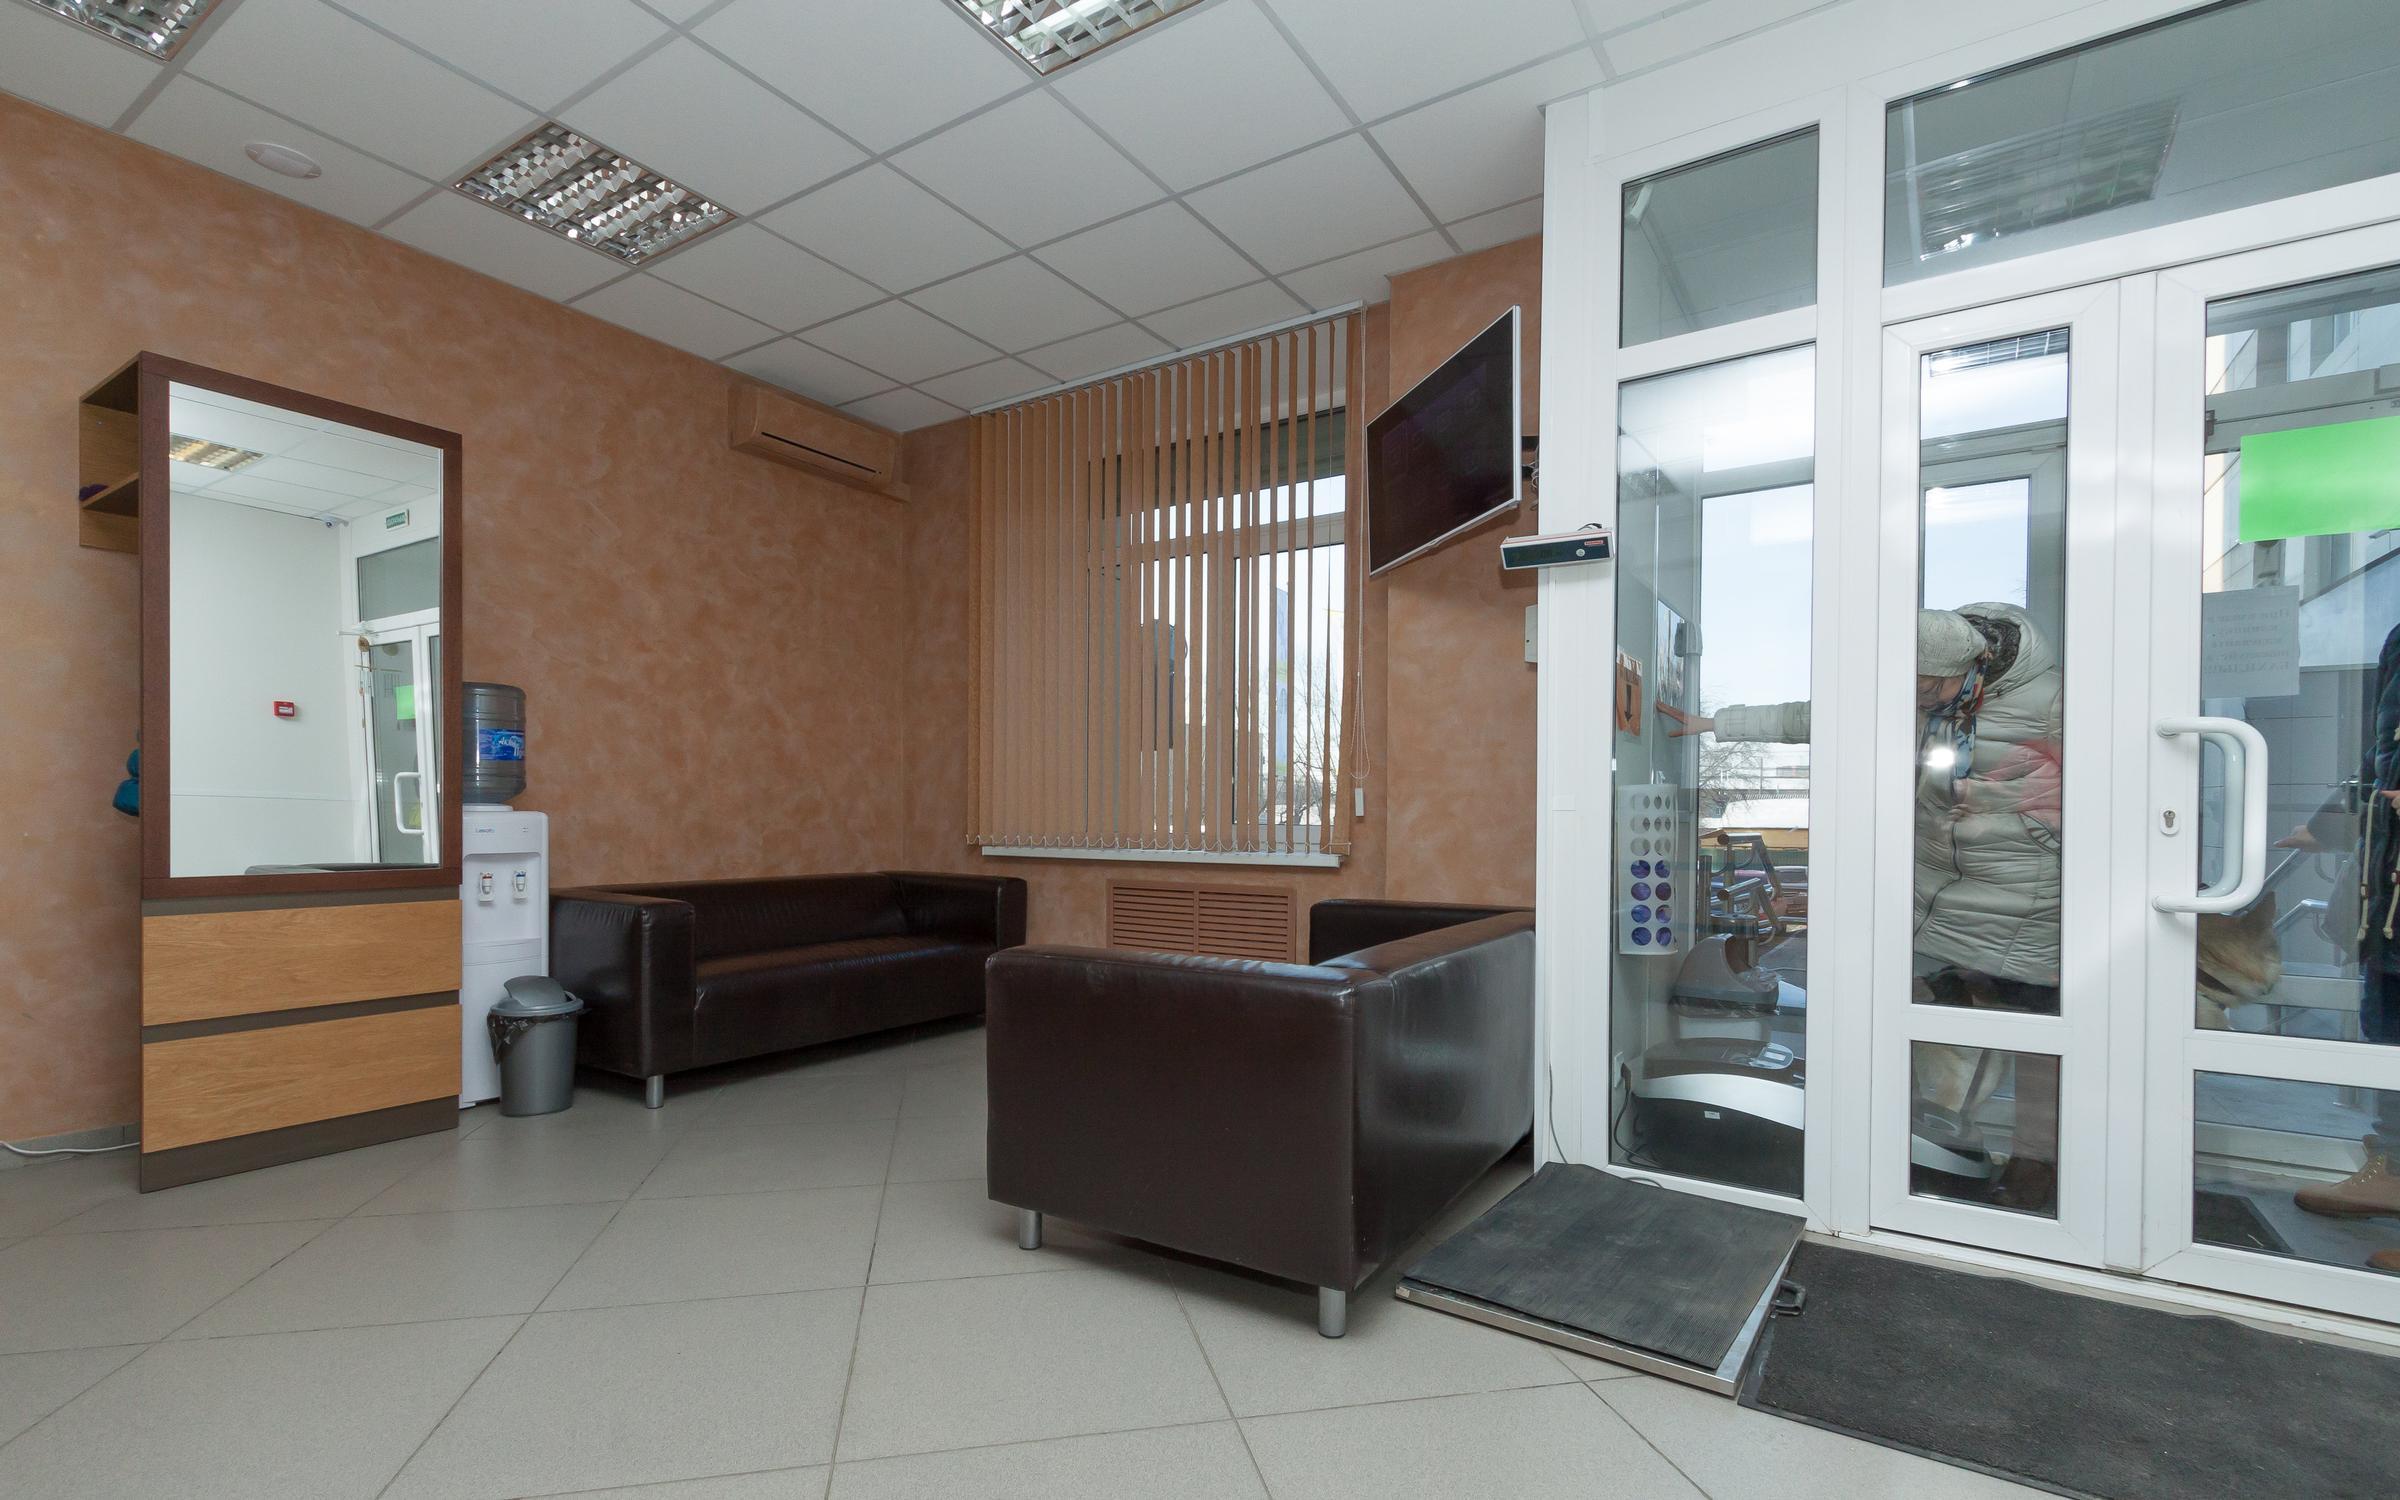 Центральная районная больница кузнецкого района